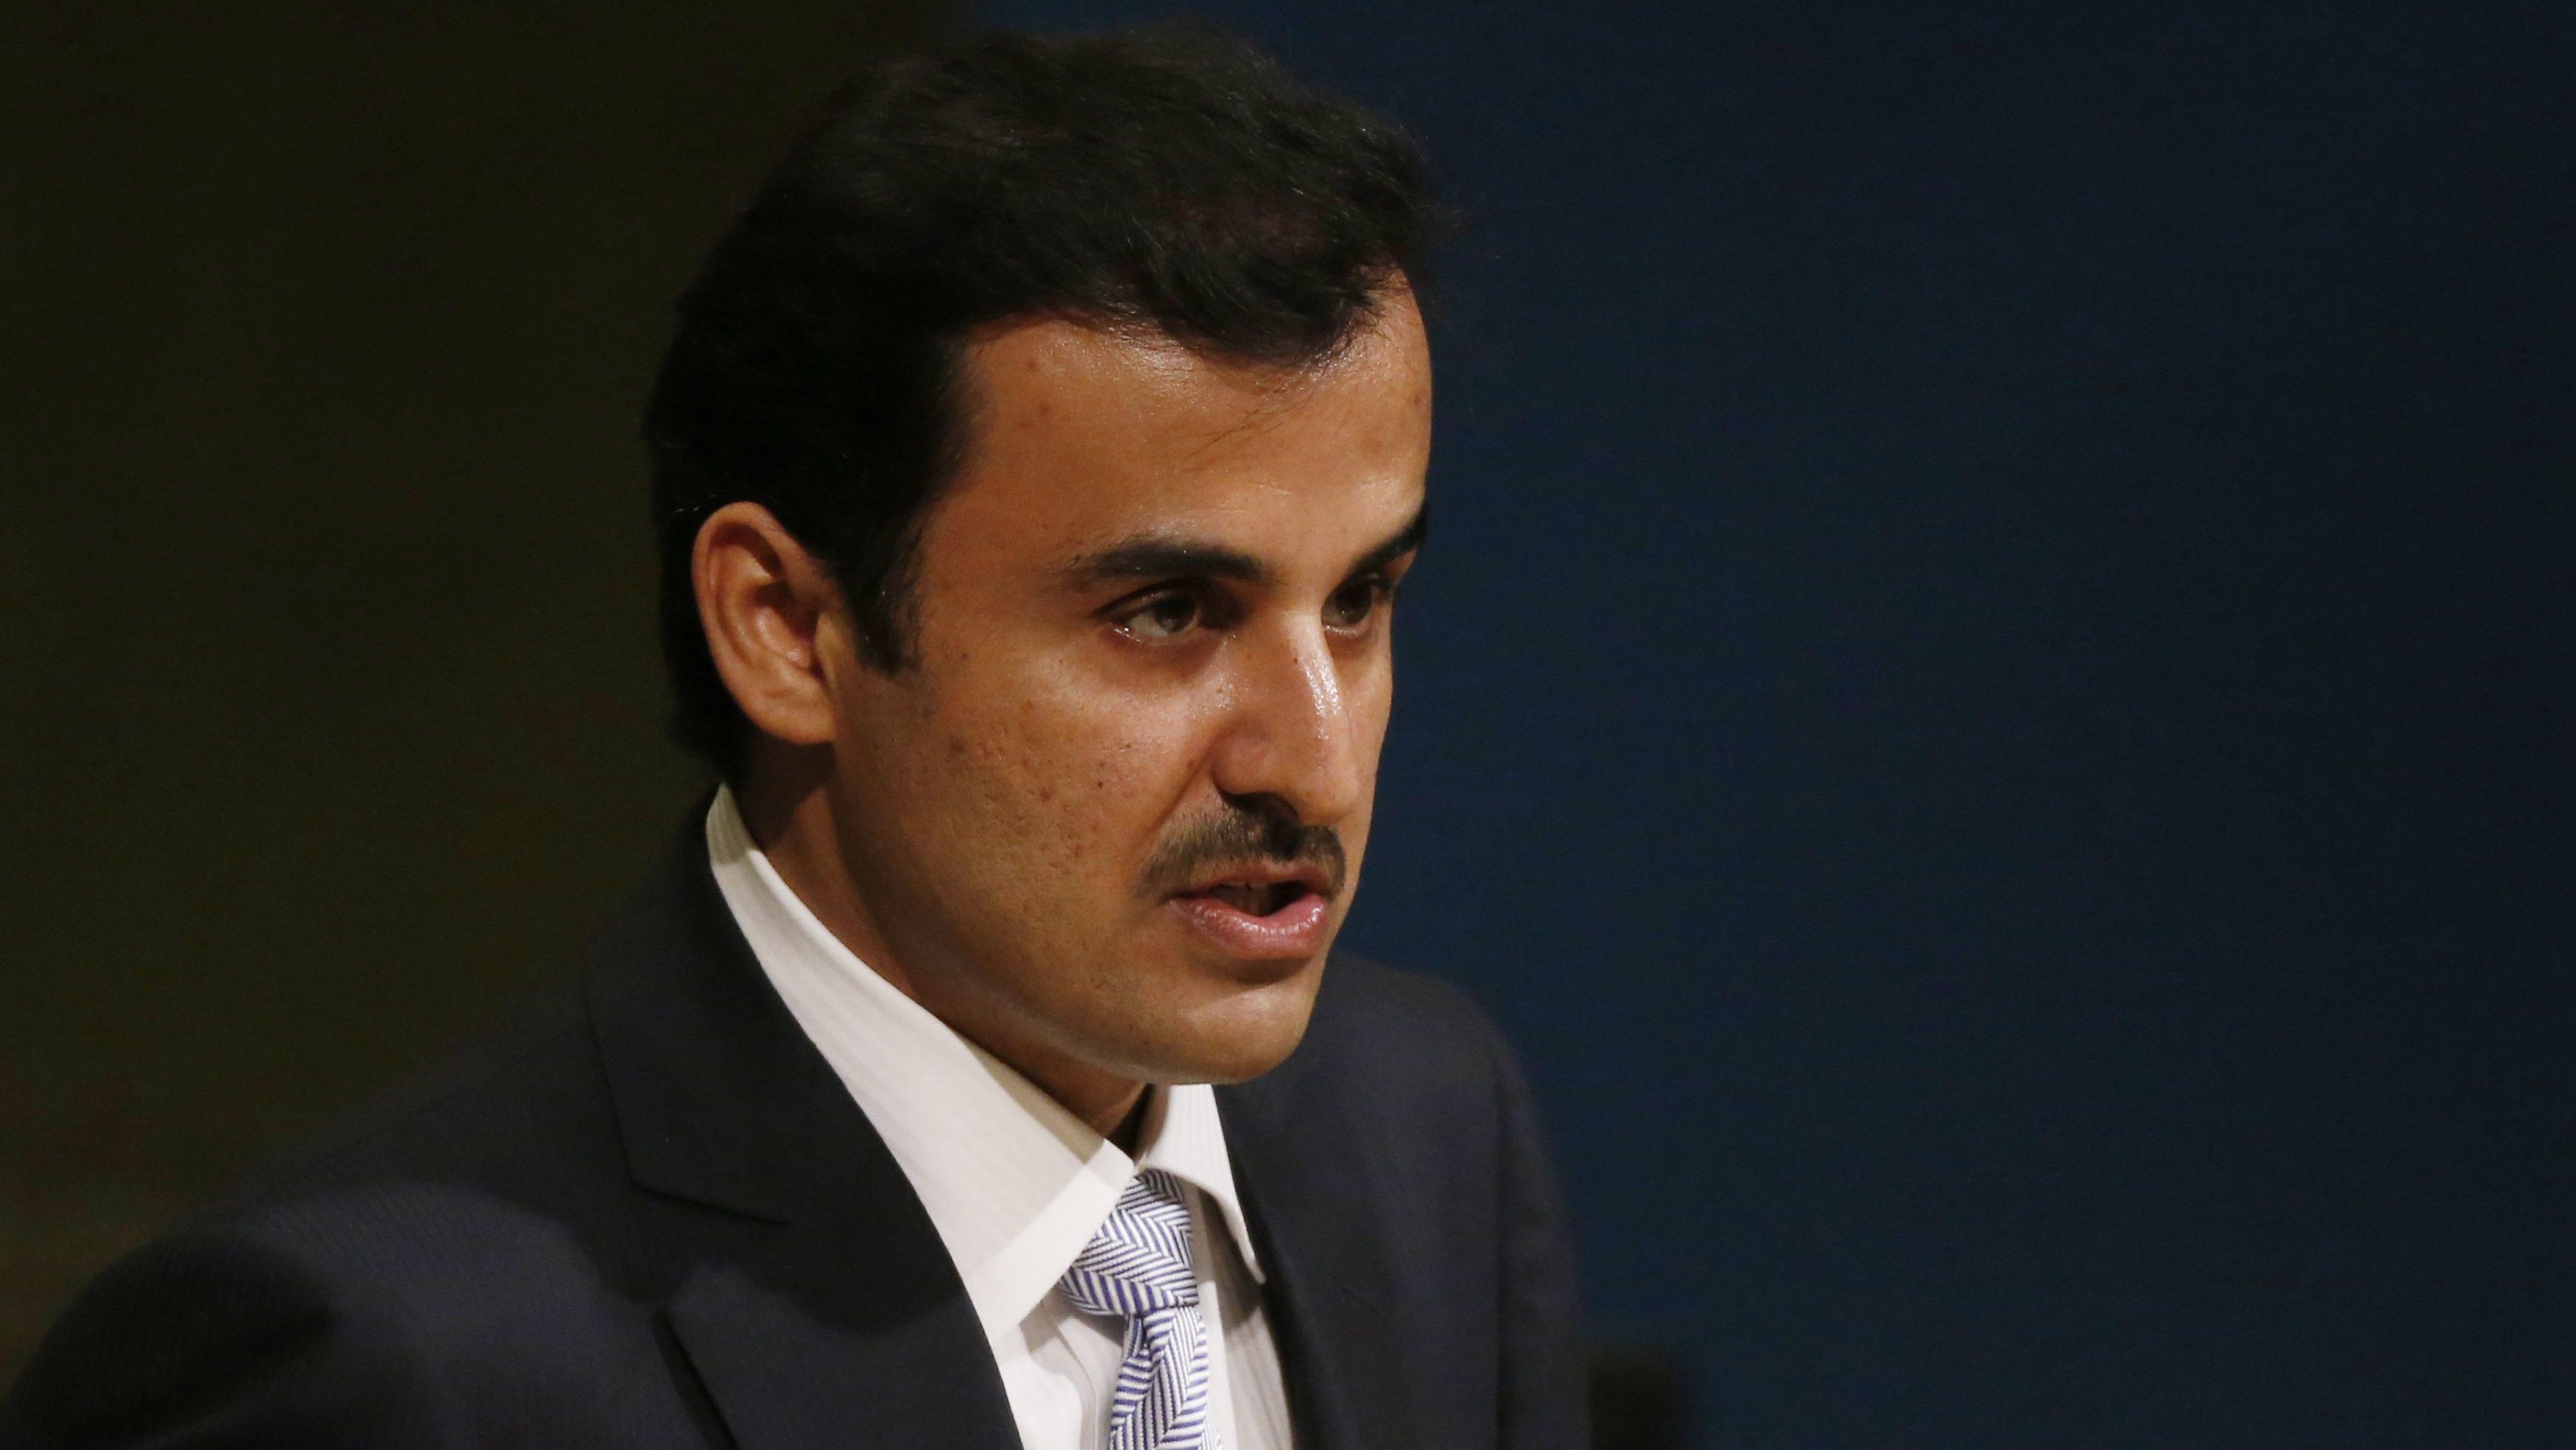 Qatari Emir accepts PM's resignation